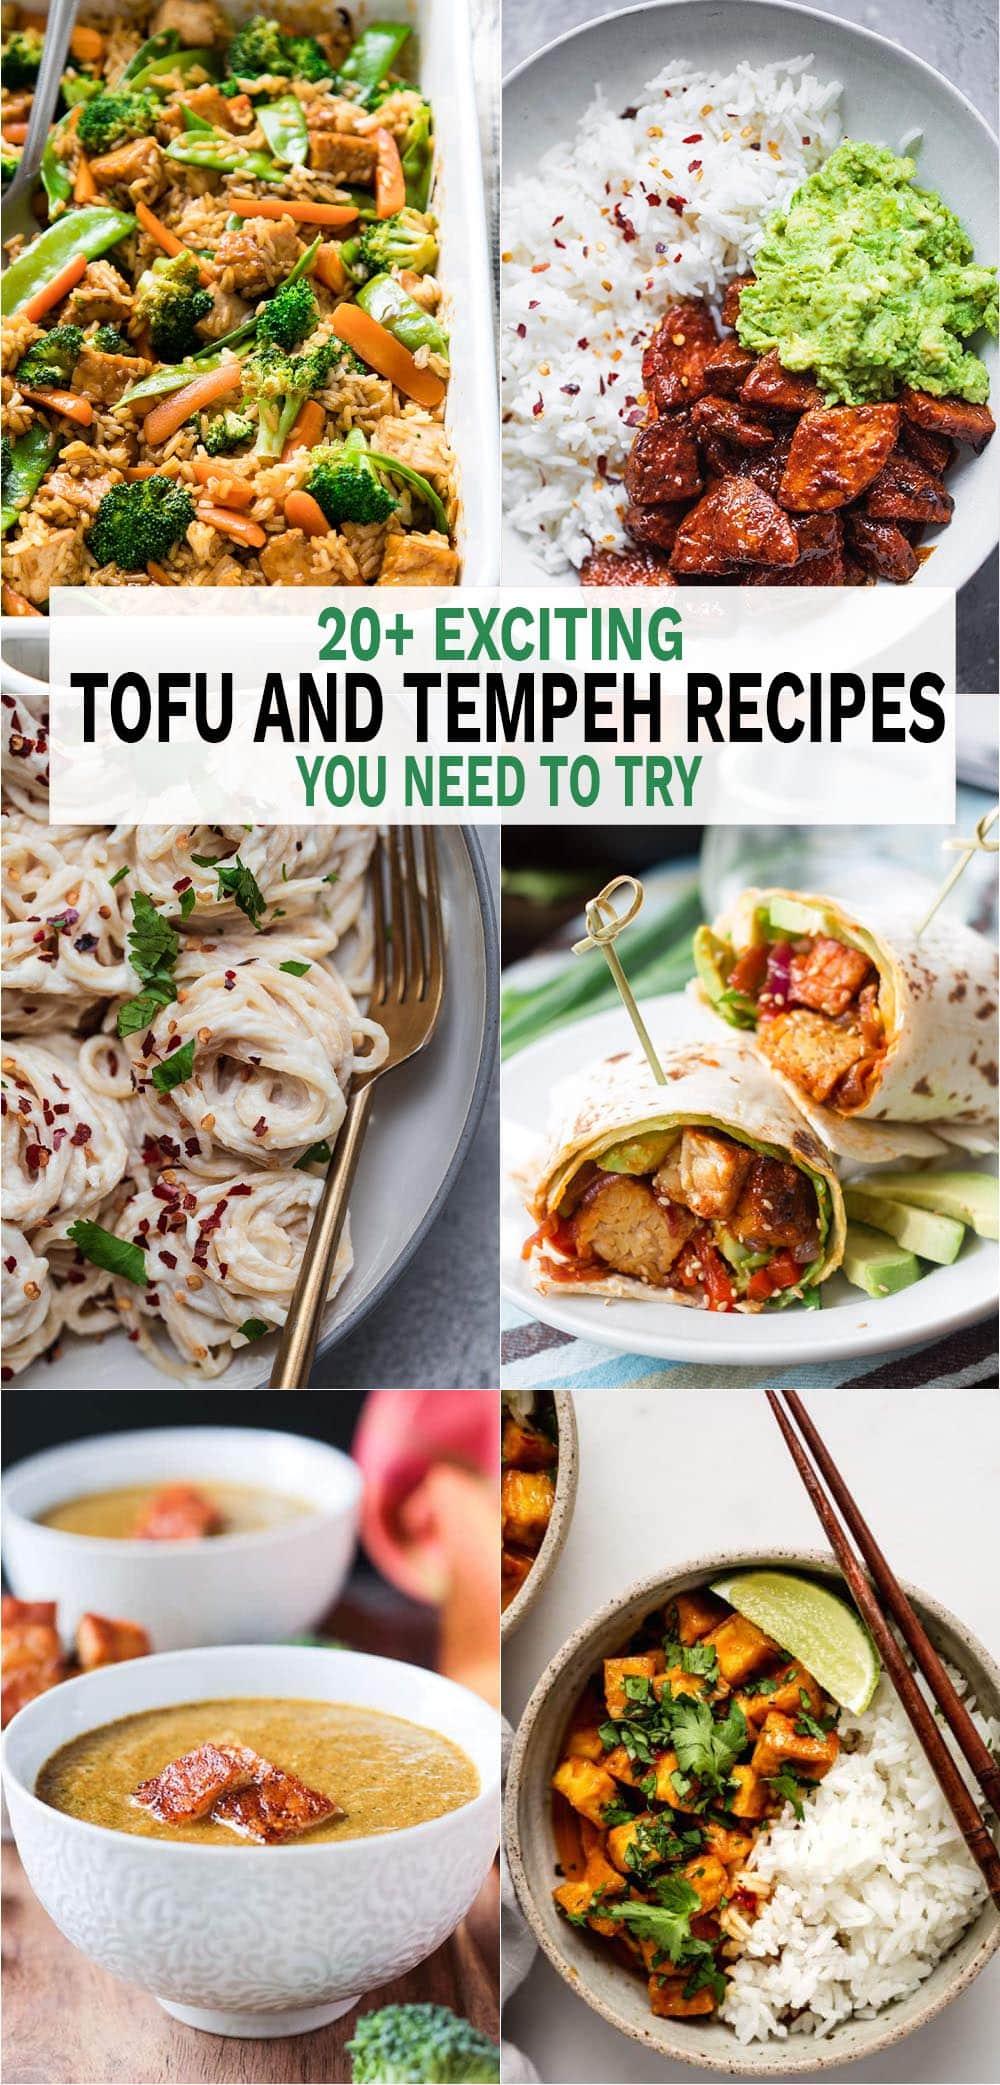 20+ Tofu and Tempeh Recipes You Need To Try